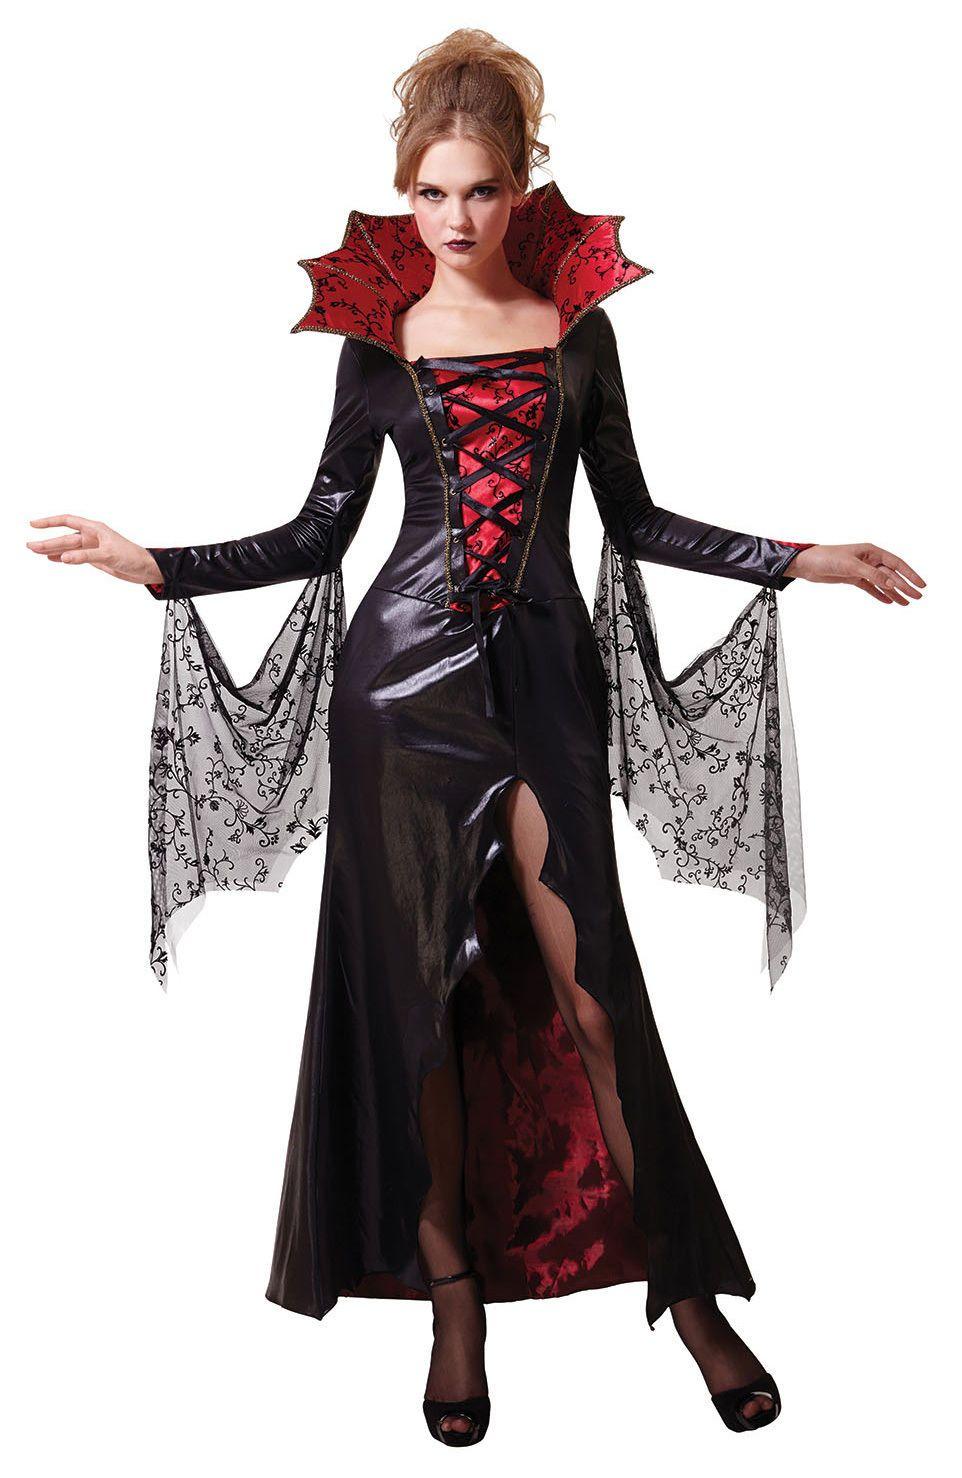 Ladies Halloween Mistress Vampire Costume Red Black Gothic Fancy Dress New 12 Ebay In 2020 Fancy Dress Costumes Vampire Fancy Dress Costumes For Women